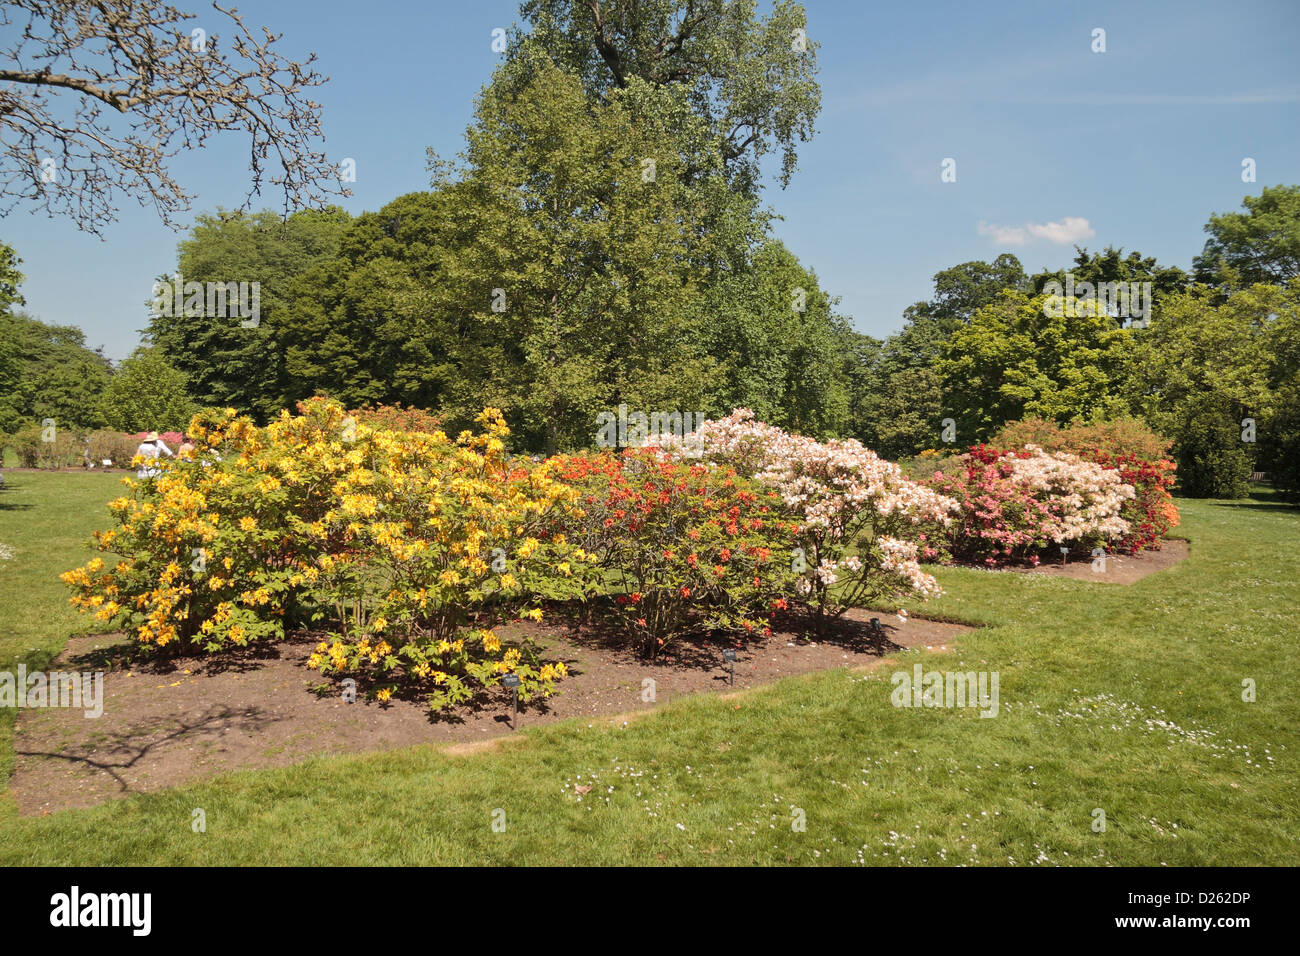 The Azalea Garden in The Royal Botanic Gardens, Kew, Surrey, England ...